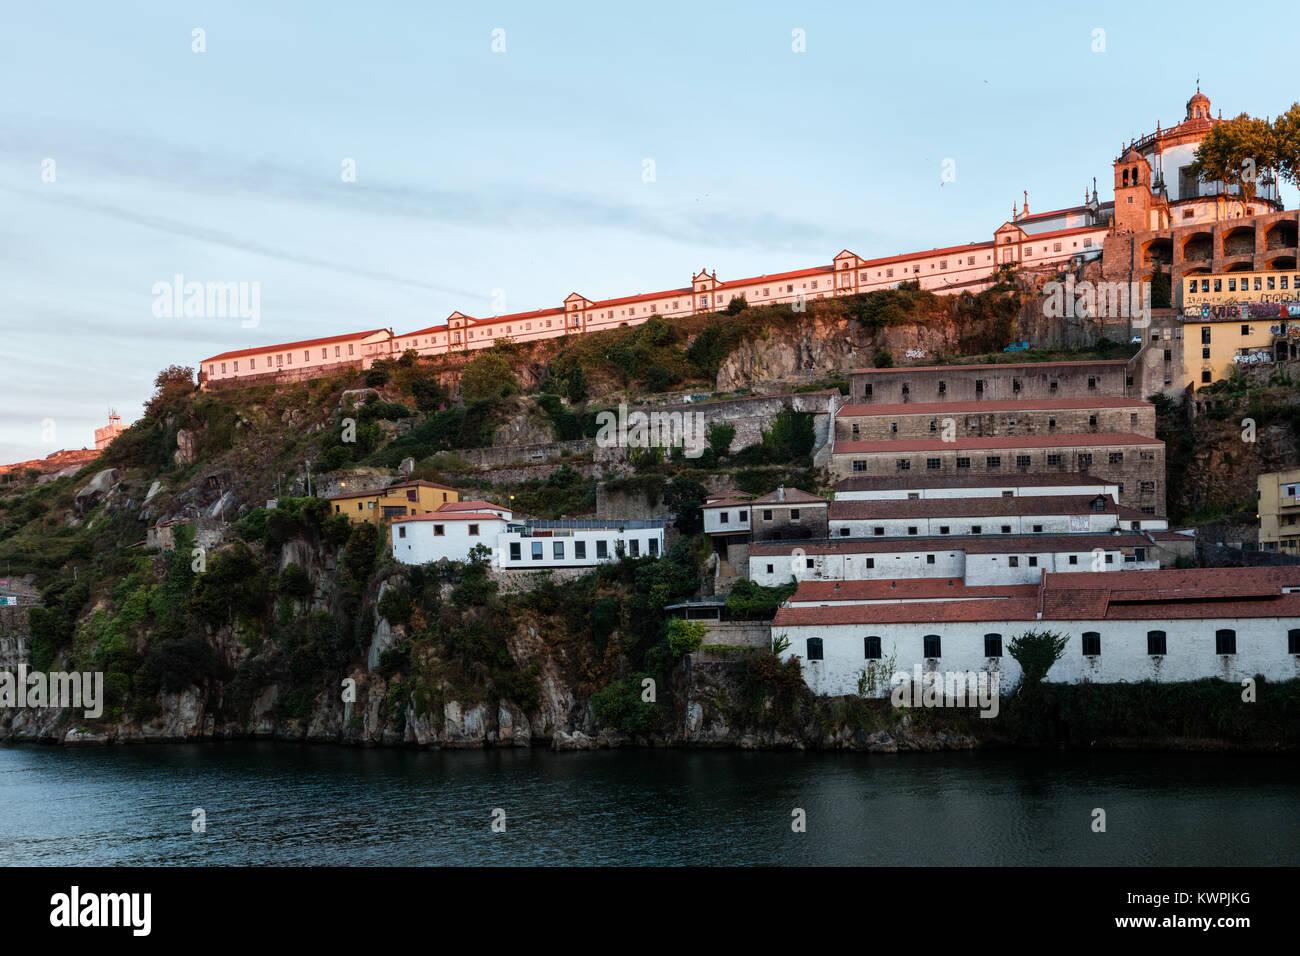 17th-century Monastery Serra do Pilar in Porto, Portugal. UNESCO World Heritage since 1996. - Stock Image